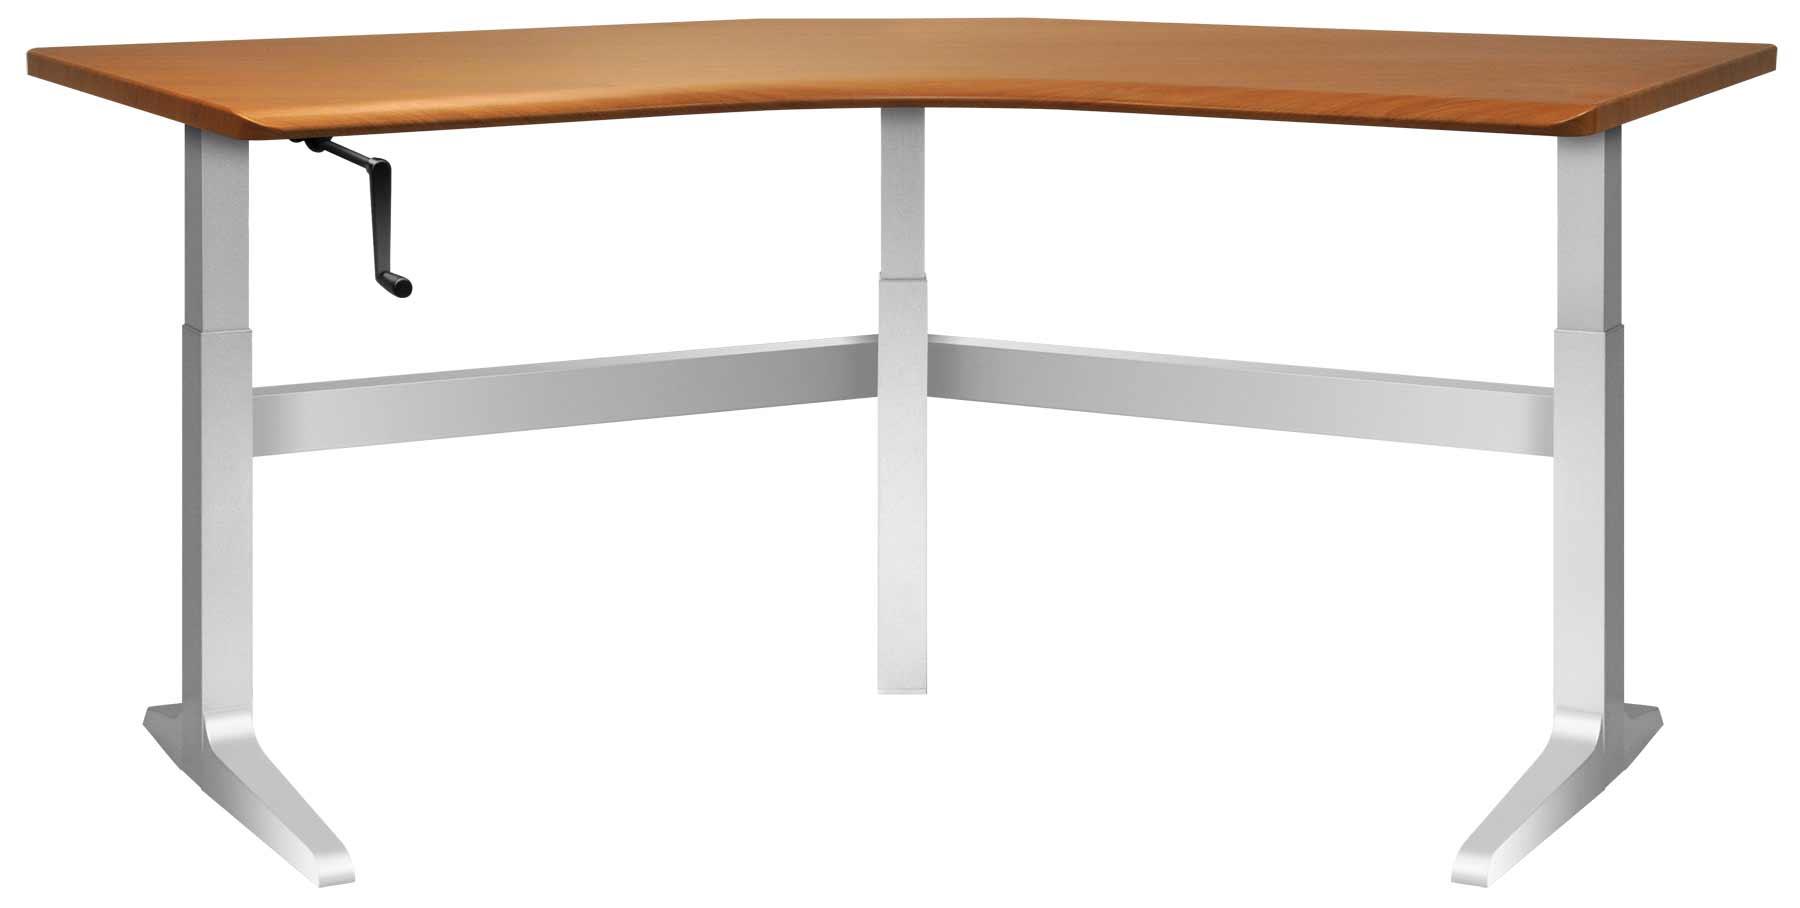 Workrite sierra green ergonomic office products